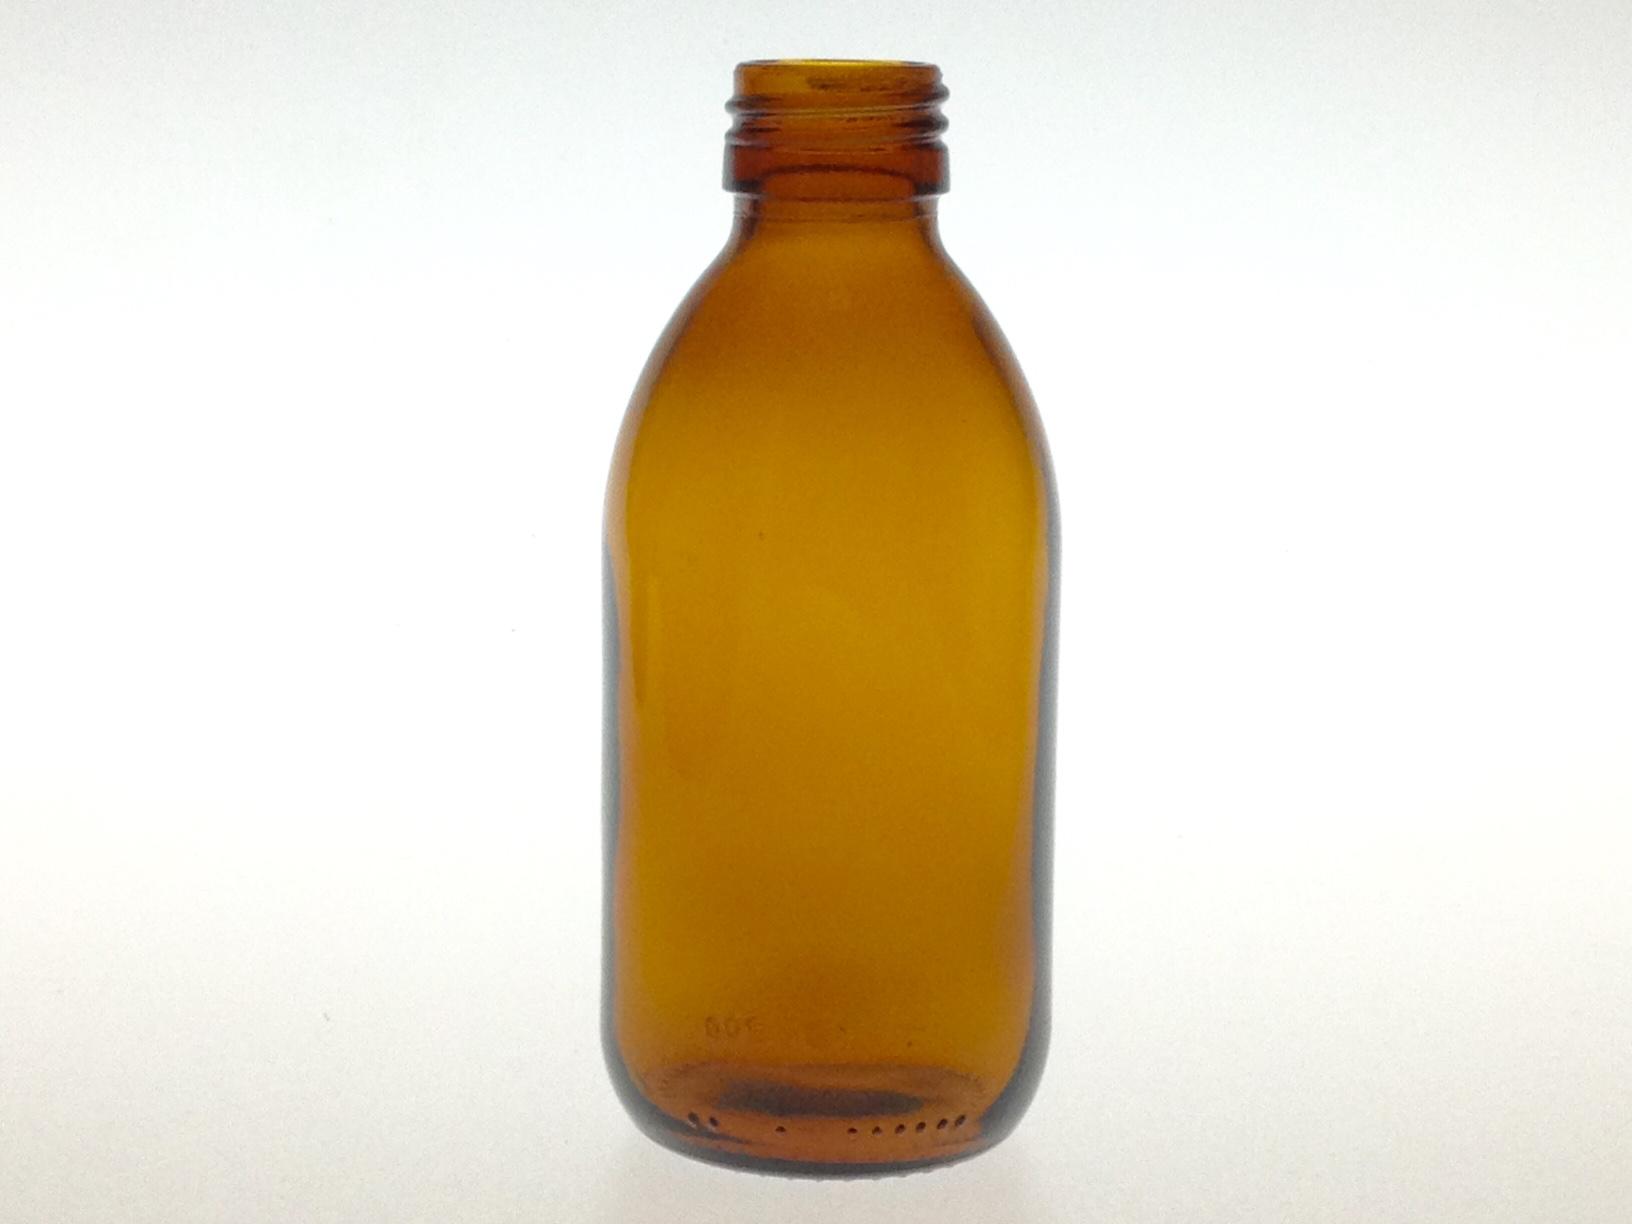 gravis flacon sirop 200 ml verre ambr pp 28. Black Bedroom Furniture Sets. Home Design Ideas